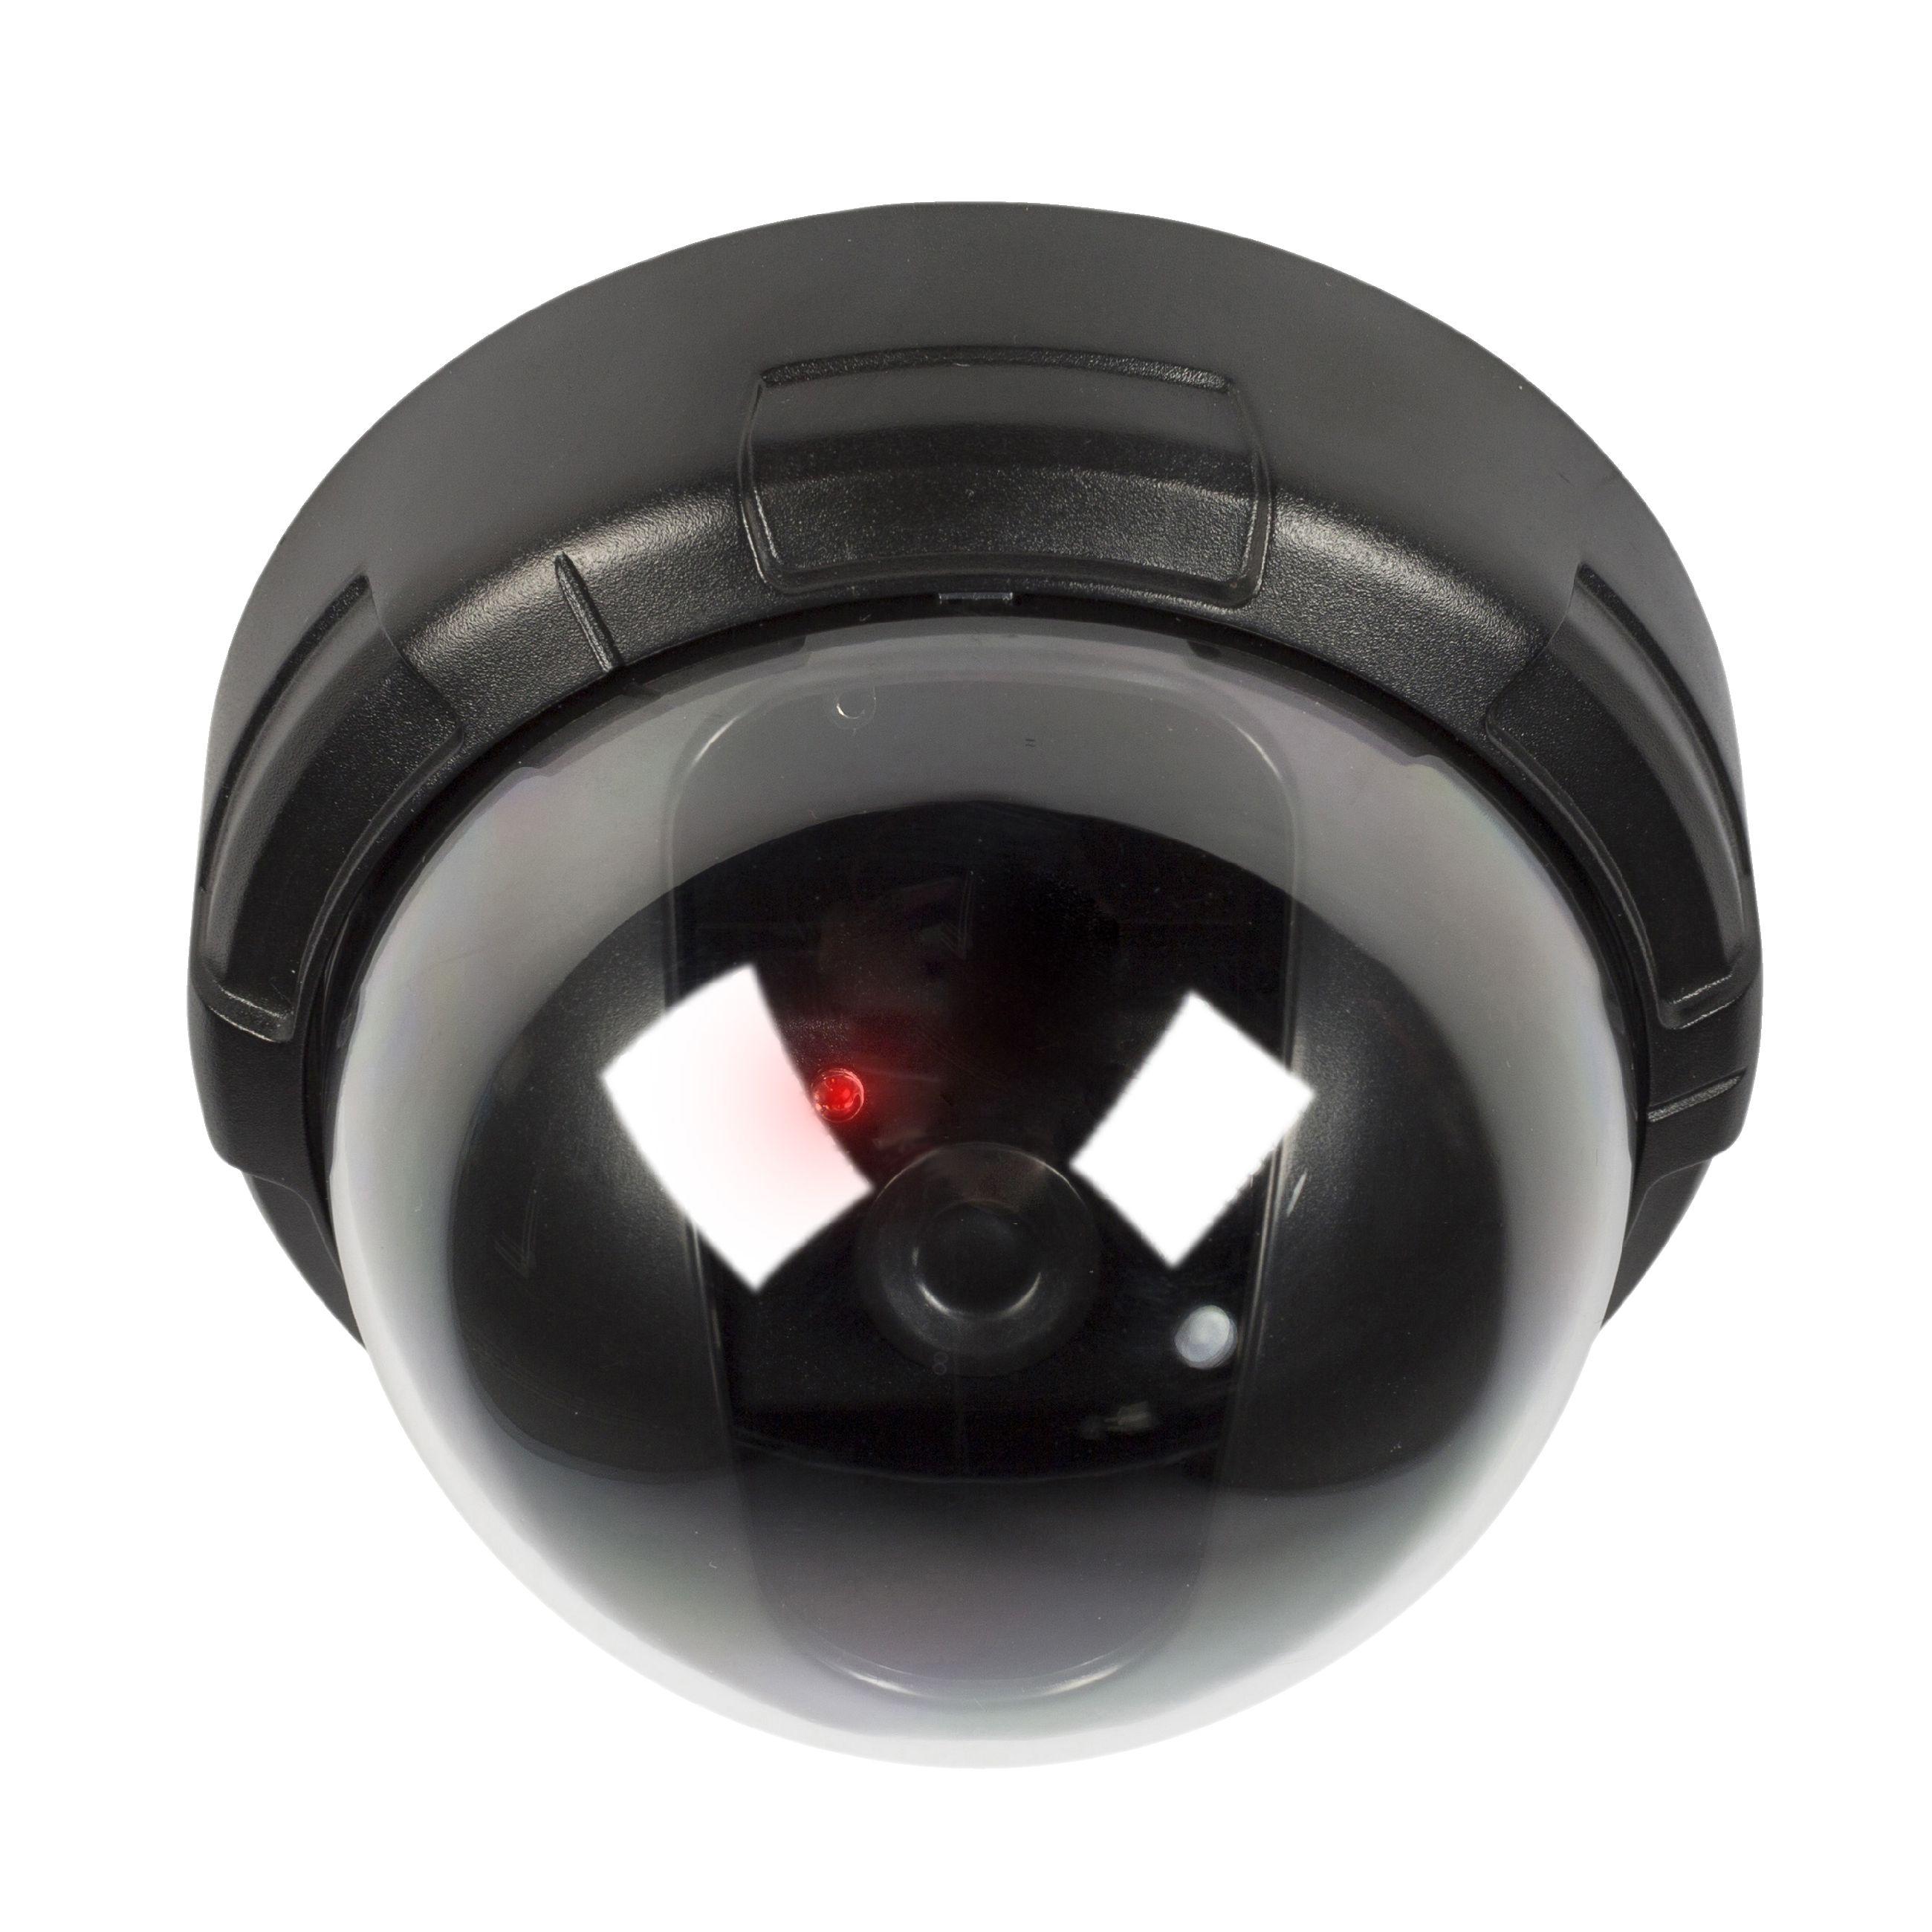 Atrapa interiérové bezpečnostní DOME kamery, černá König SAS-DUMMY010B